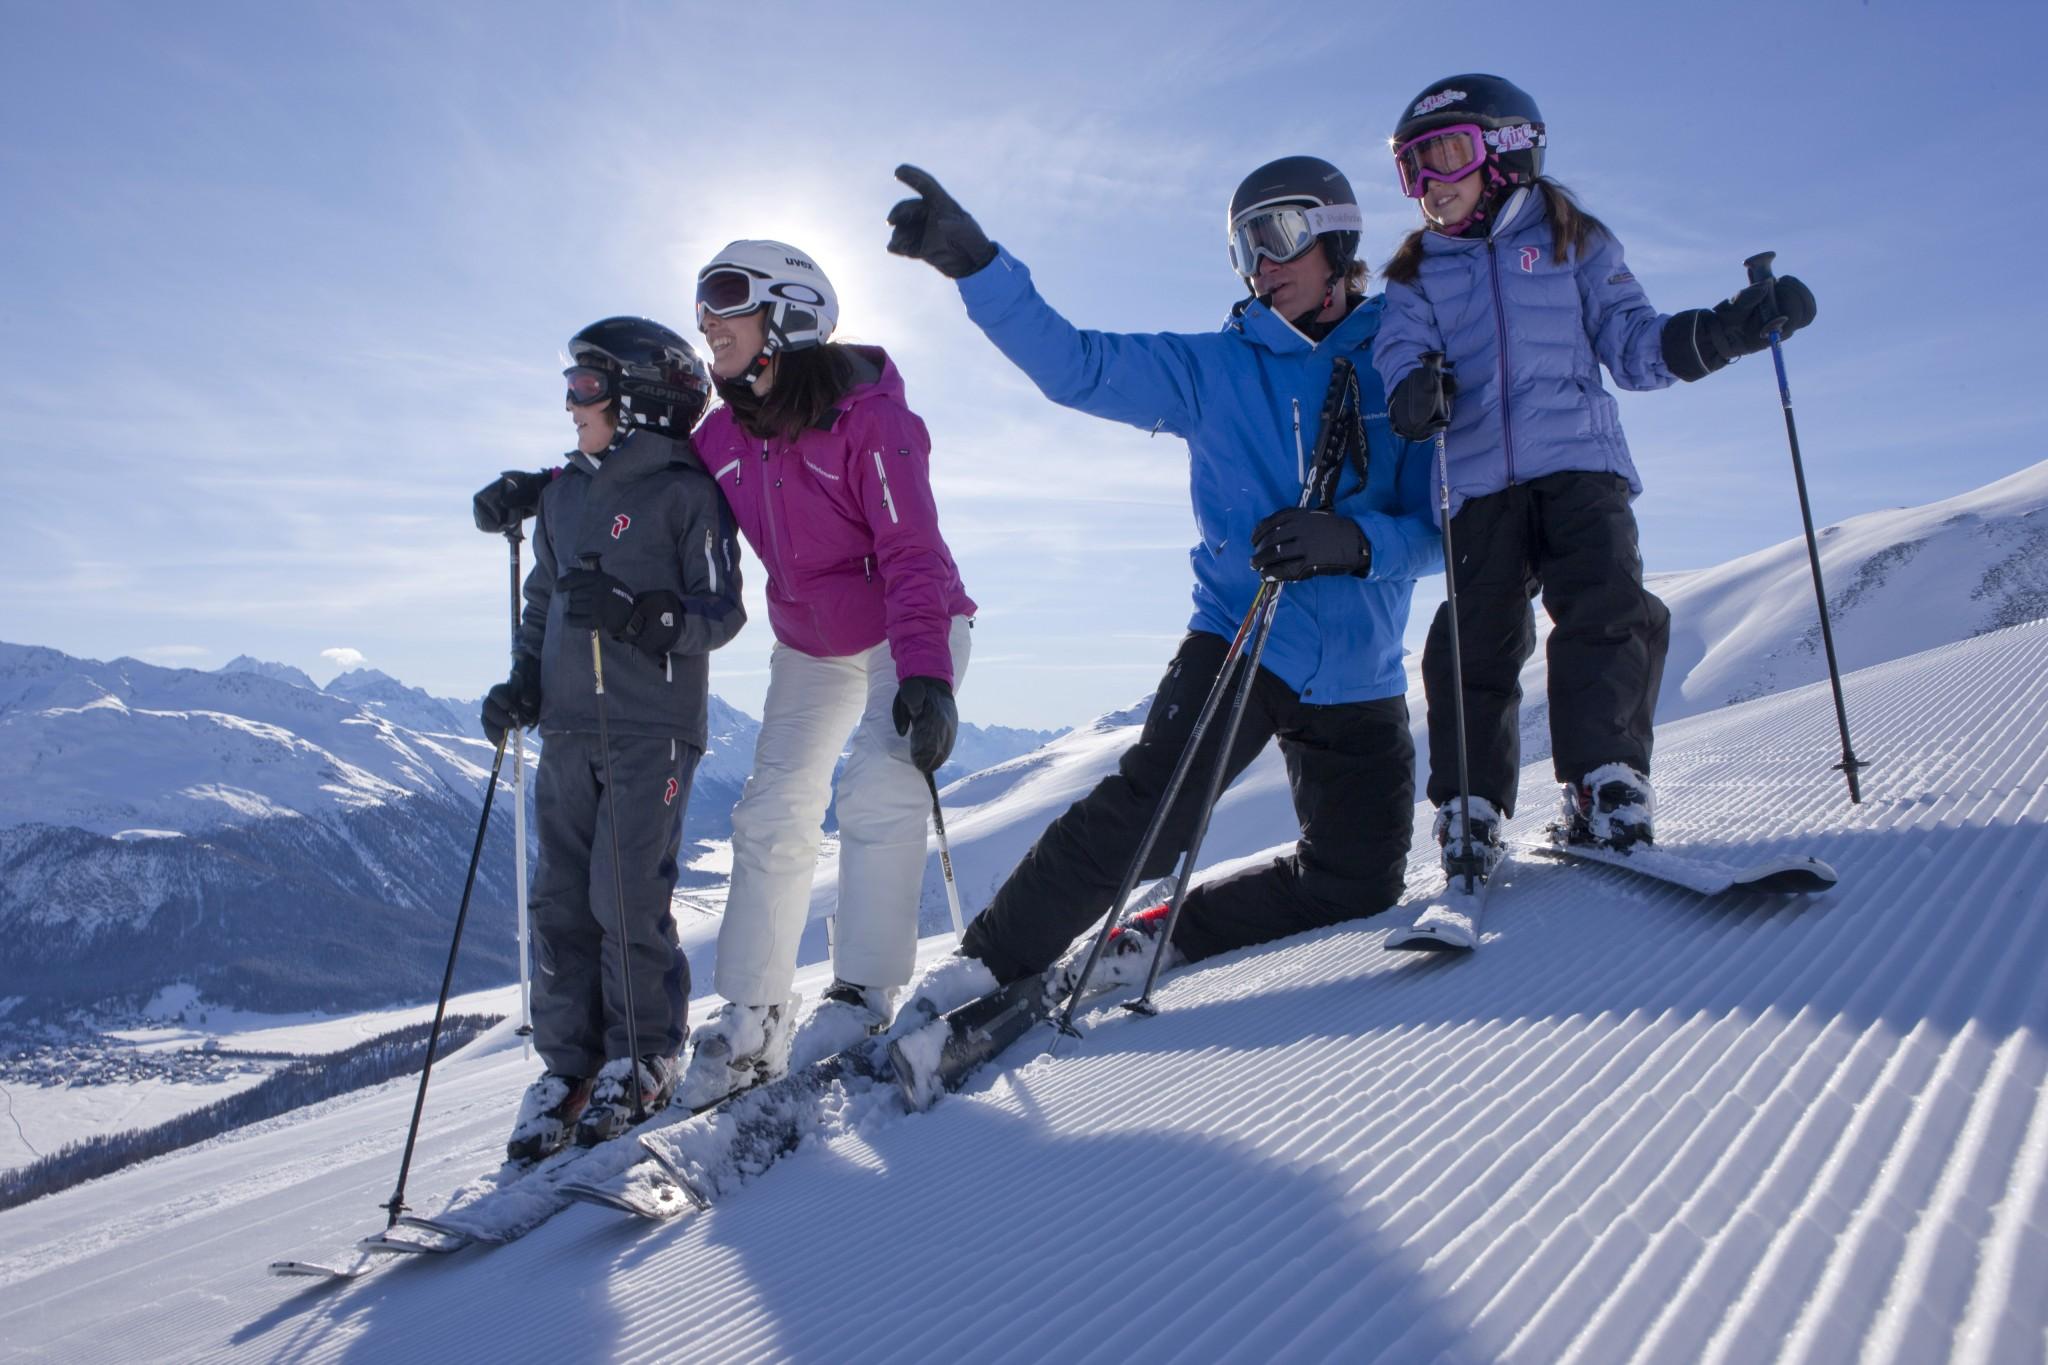 Earlier Opening And New Ski Safari at St MoritzCREDITSwissImageAndChristof Sonderegger (2)